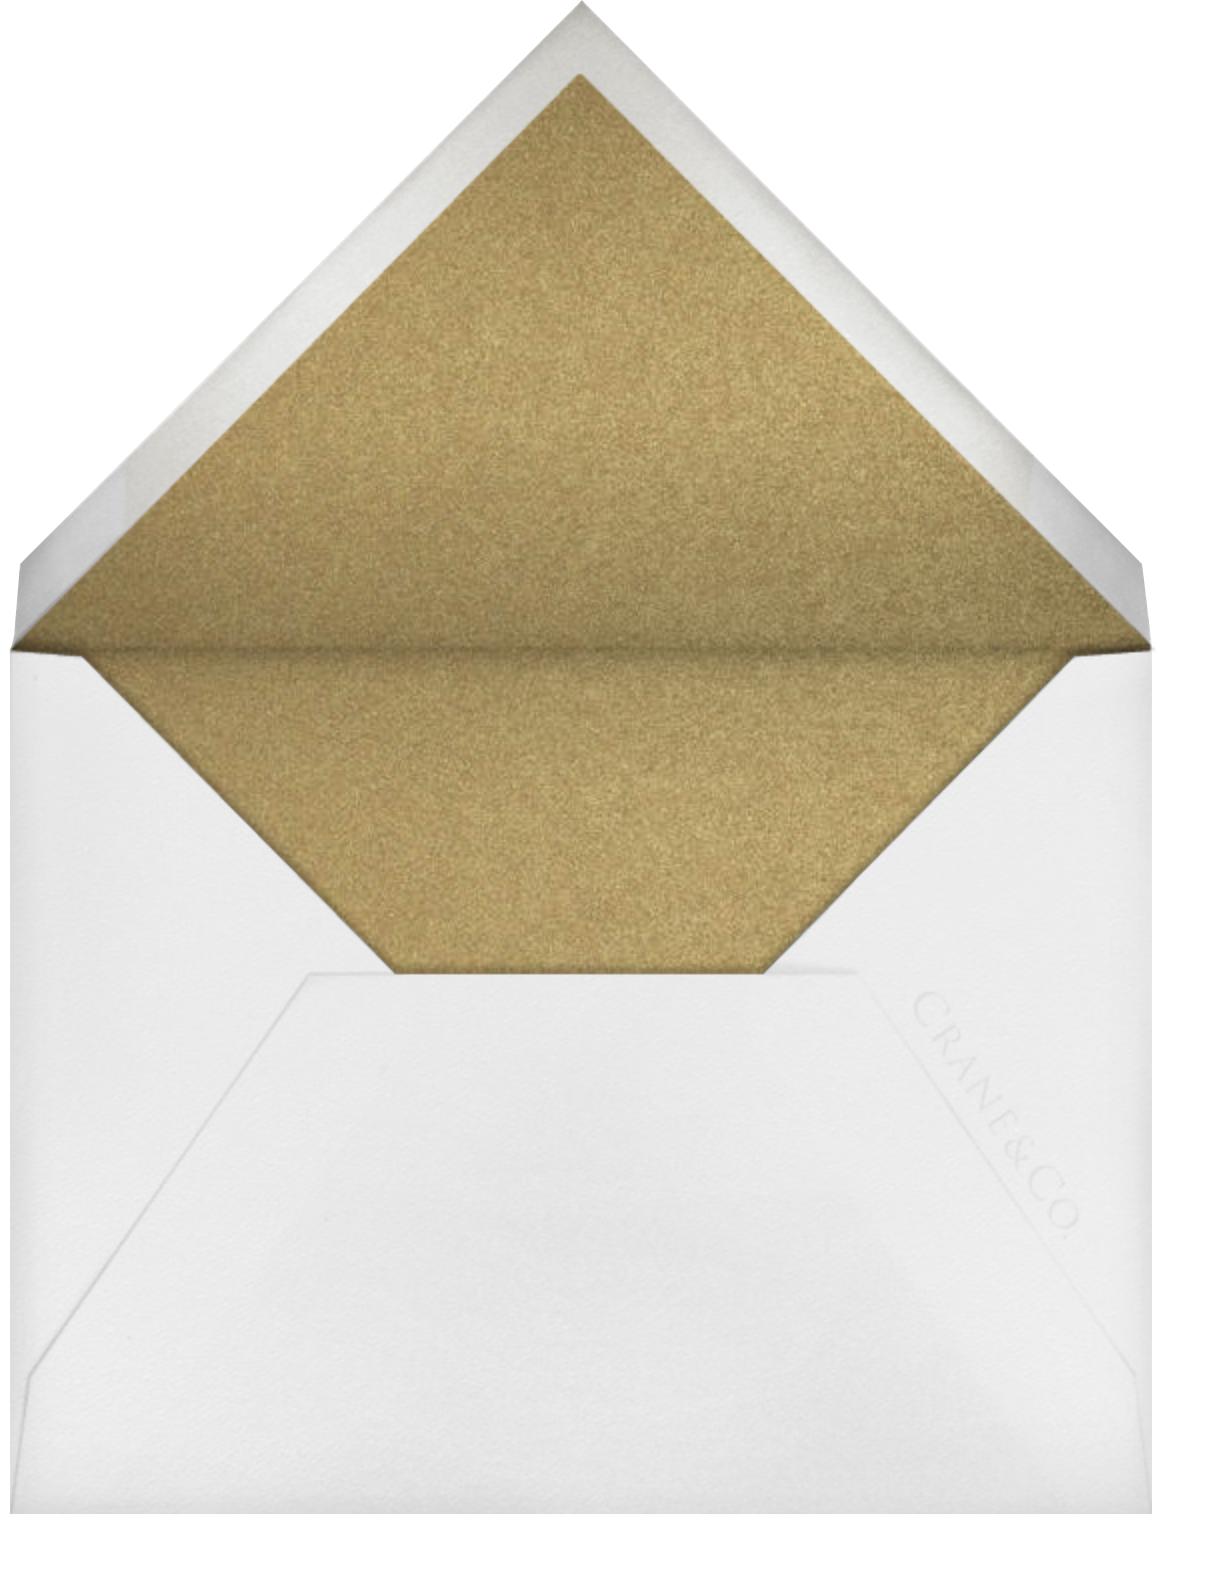 Alcazar - Medium Gold - Crane & Co. - All - envelope back